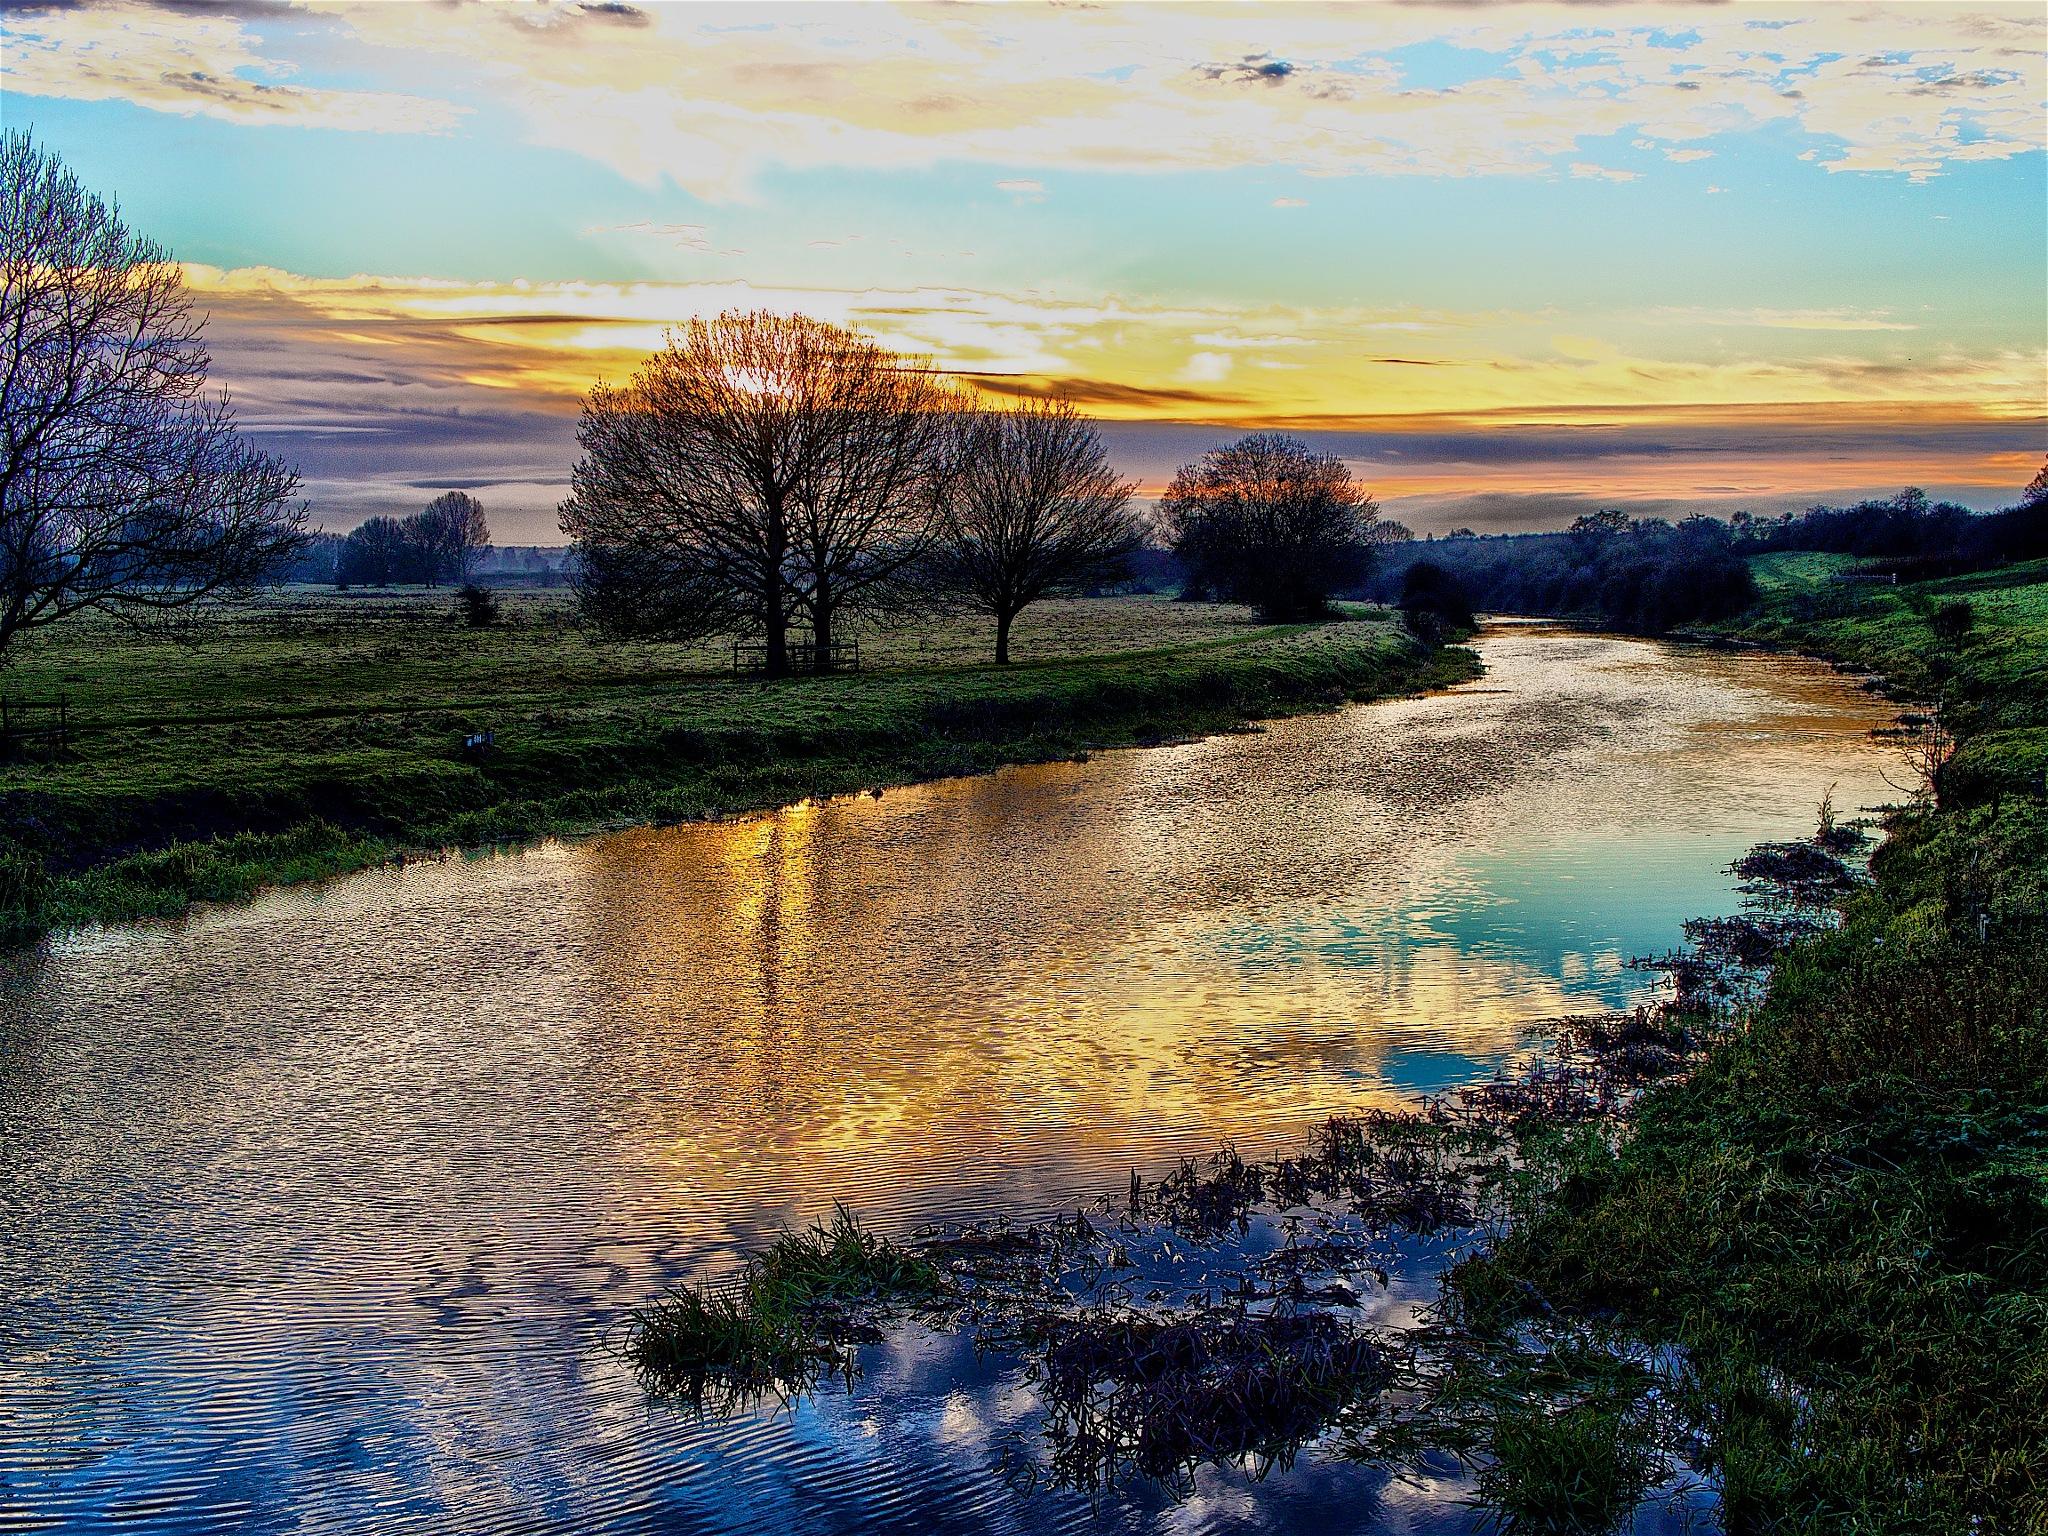 Nene valley 4 by Tony Otley